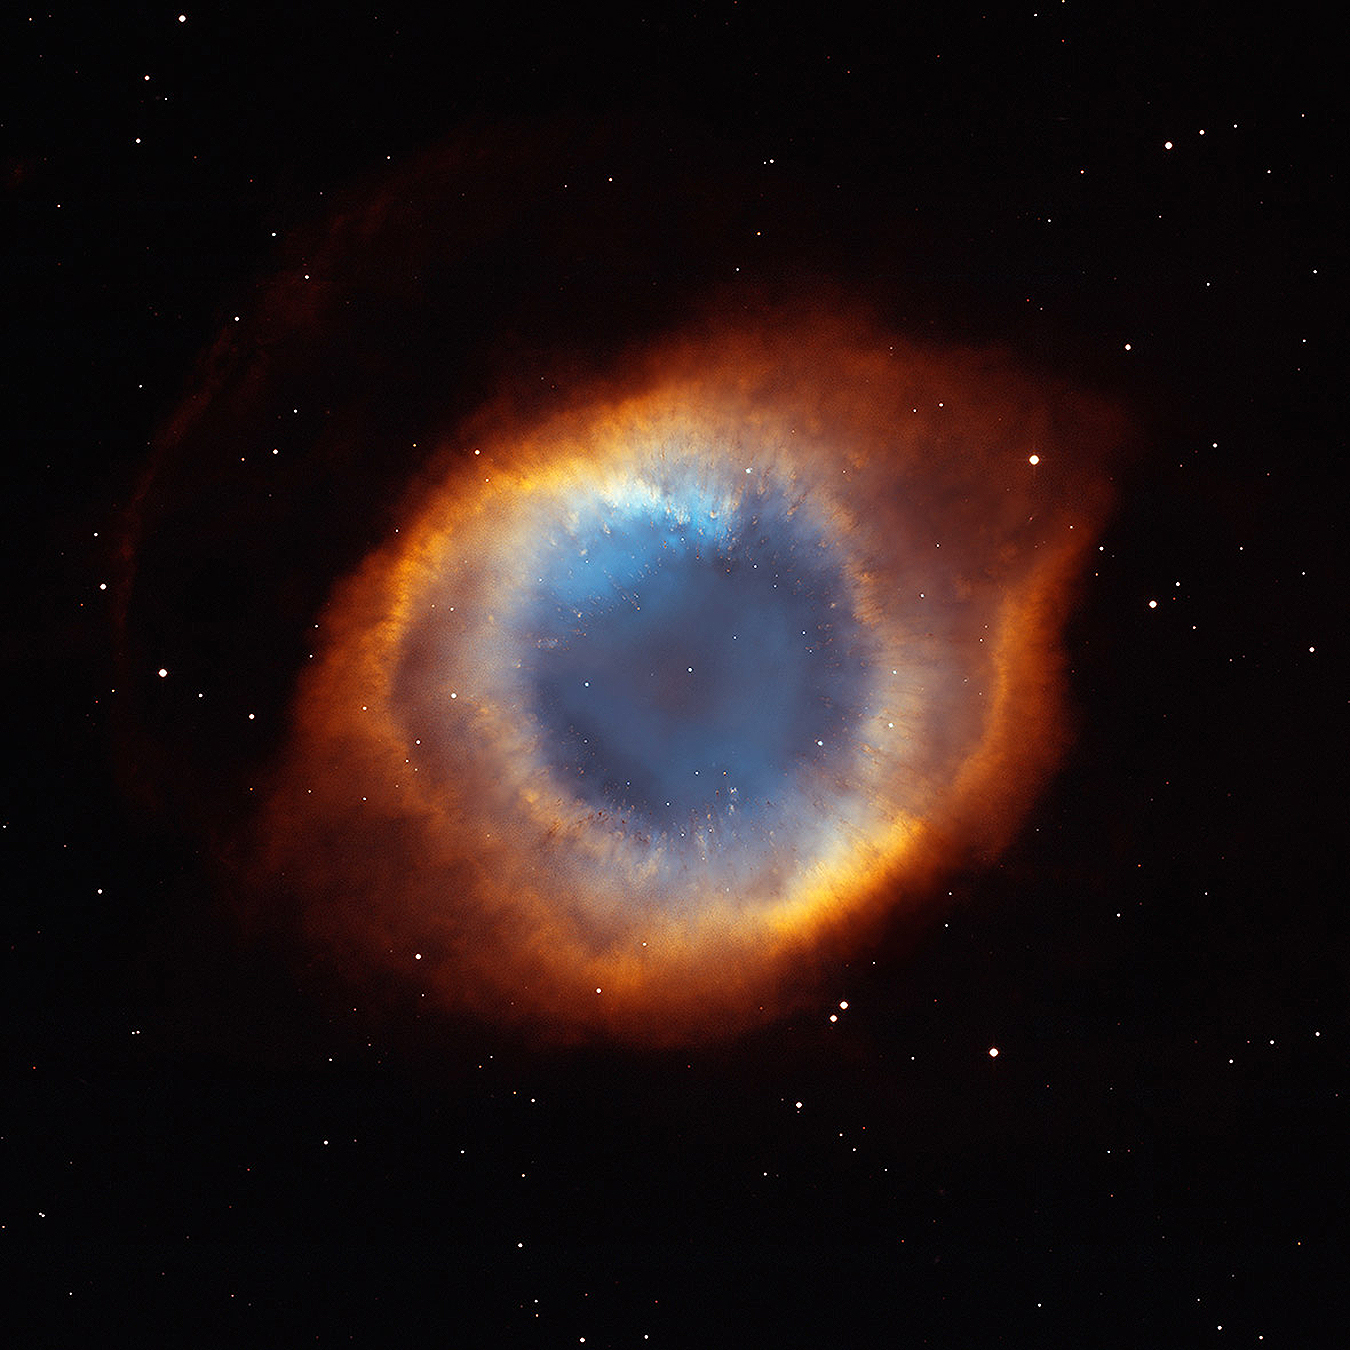 Tony_Ward_solar_hubble-space-telescope-best-pictures